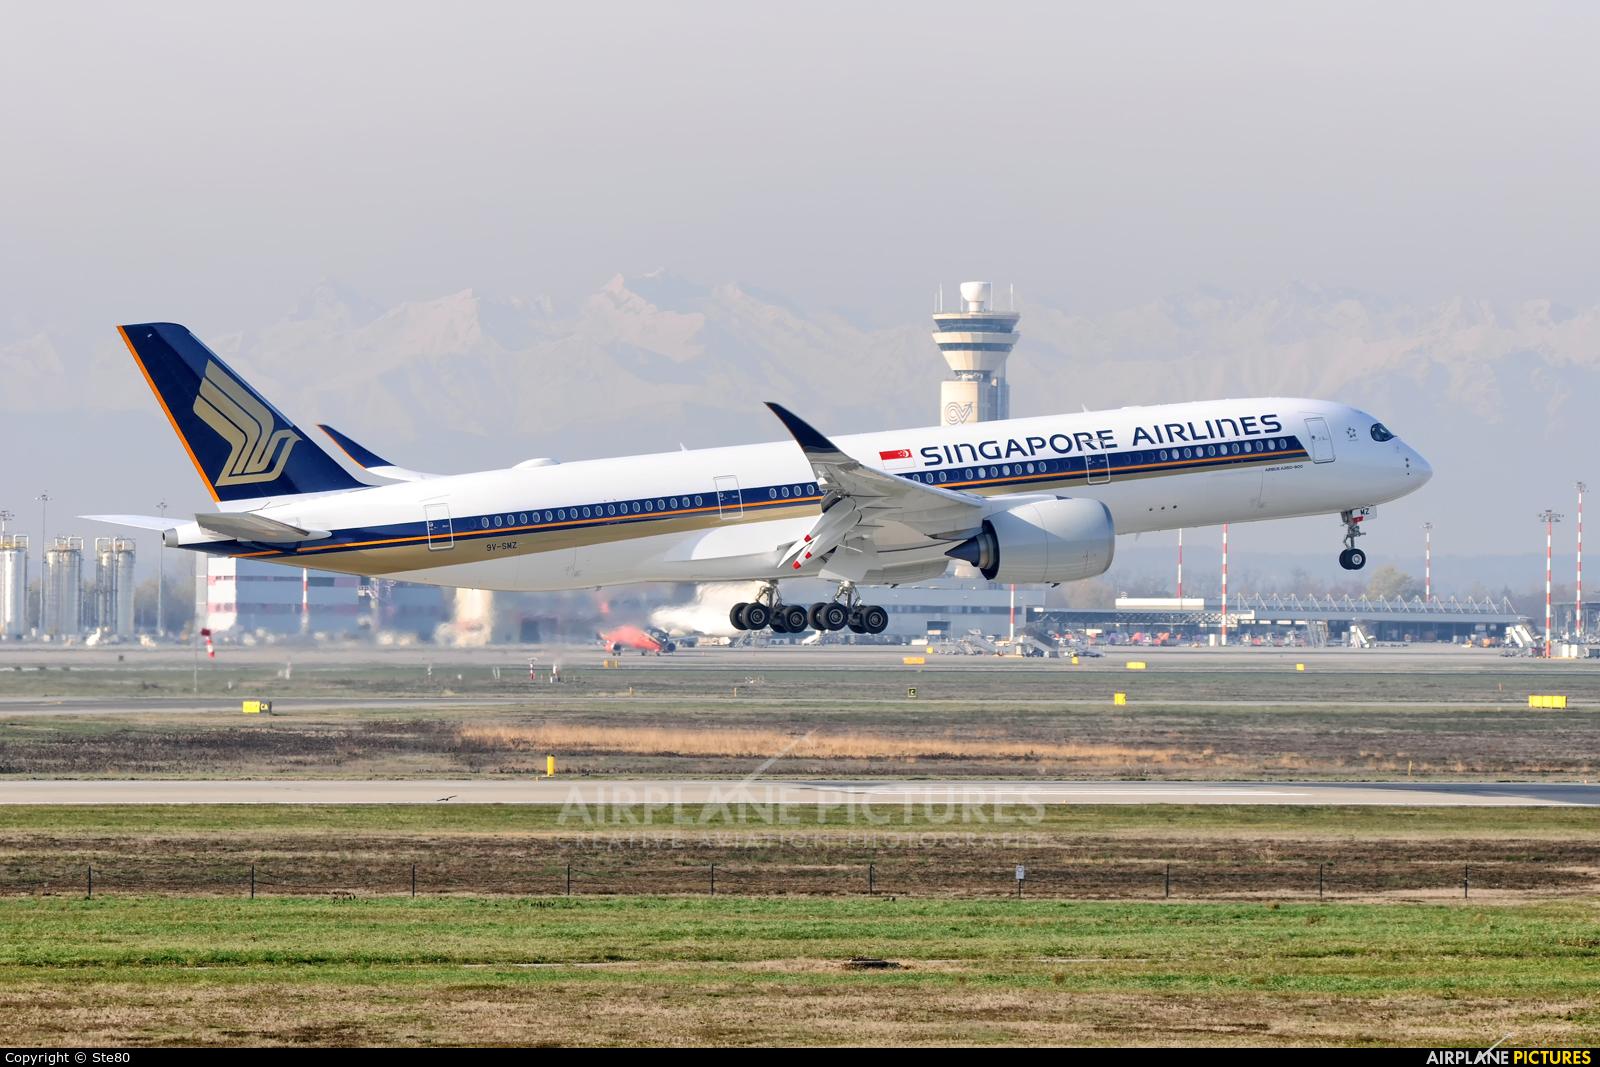 Singapore Airlines 9V-SMZ aircraft at Milan - Malpensa